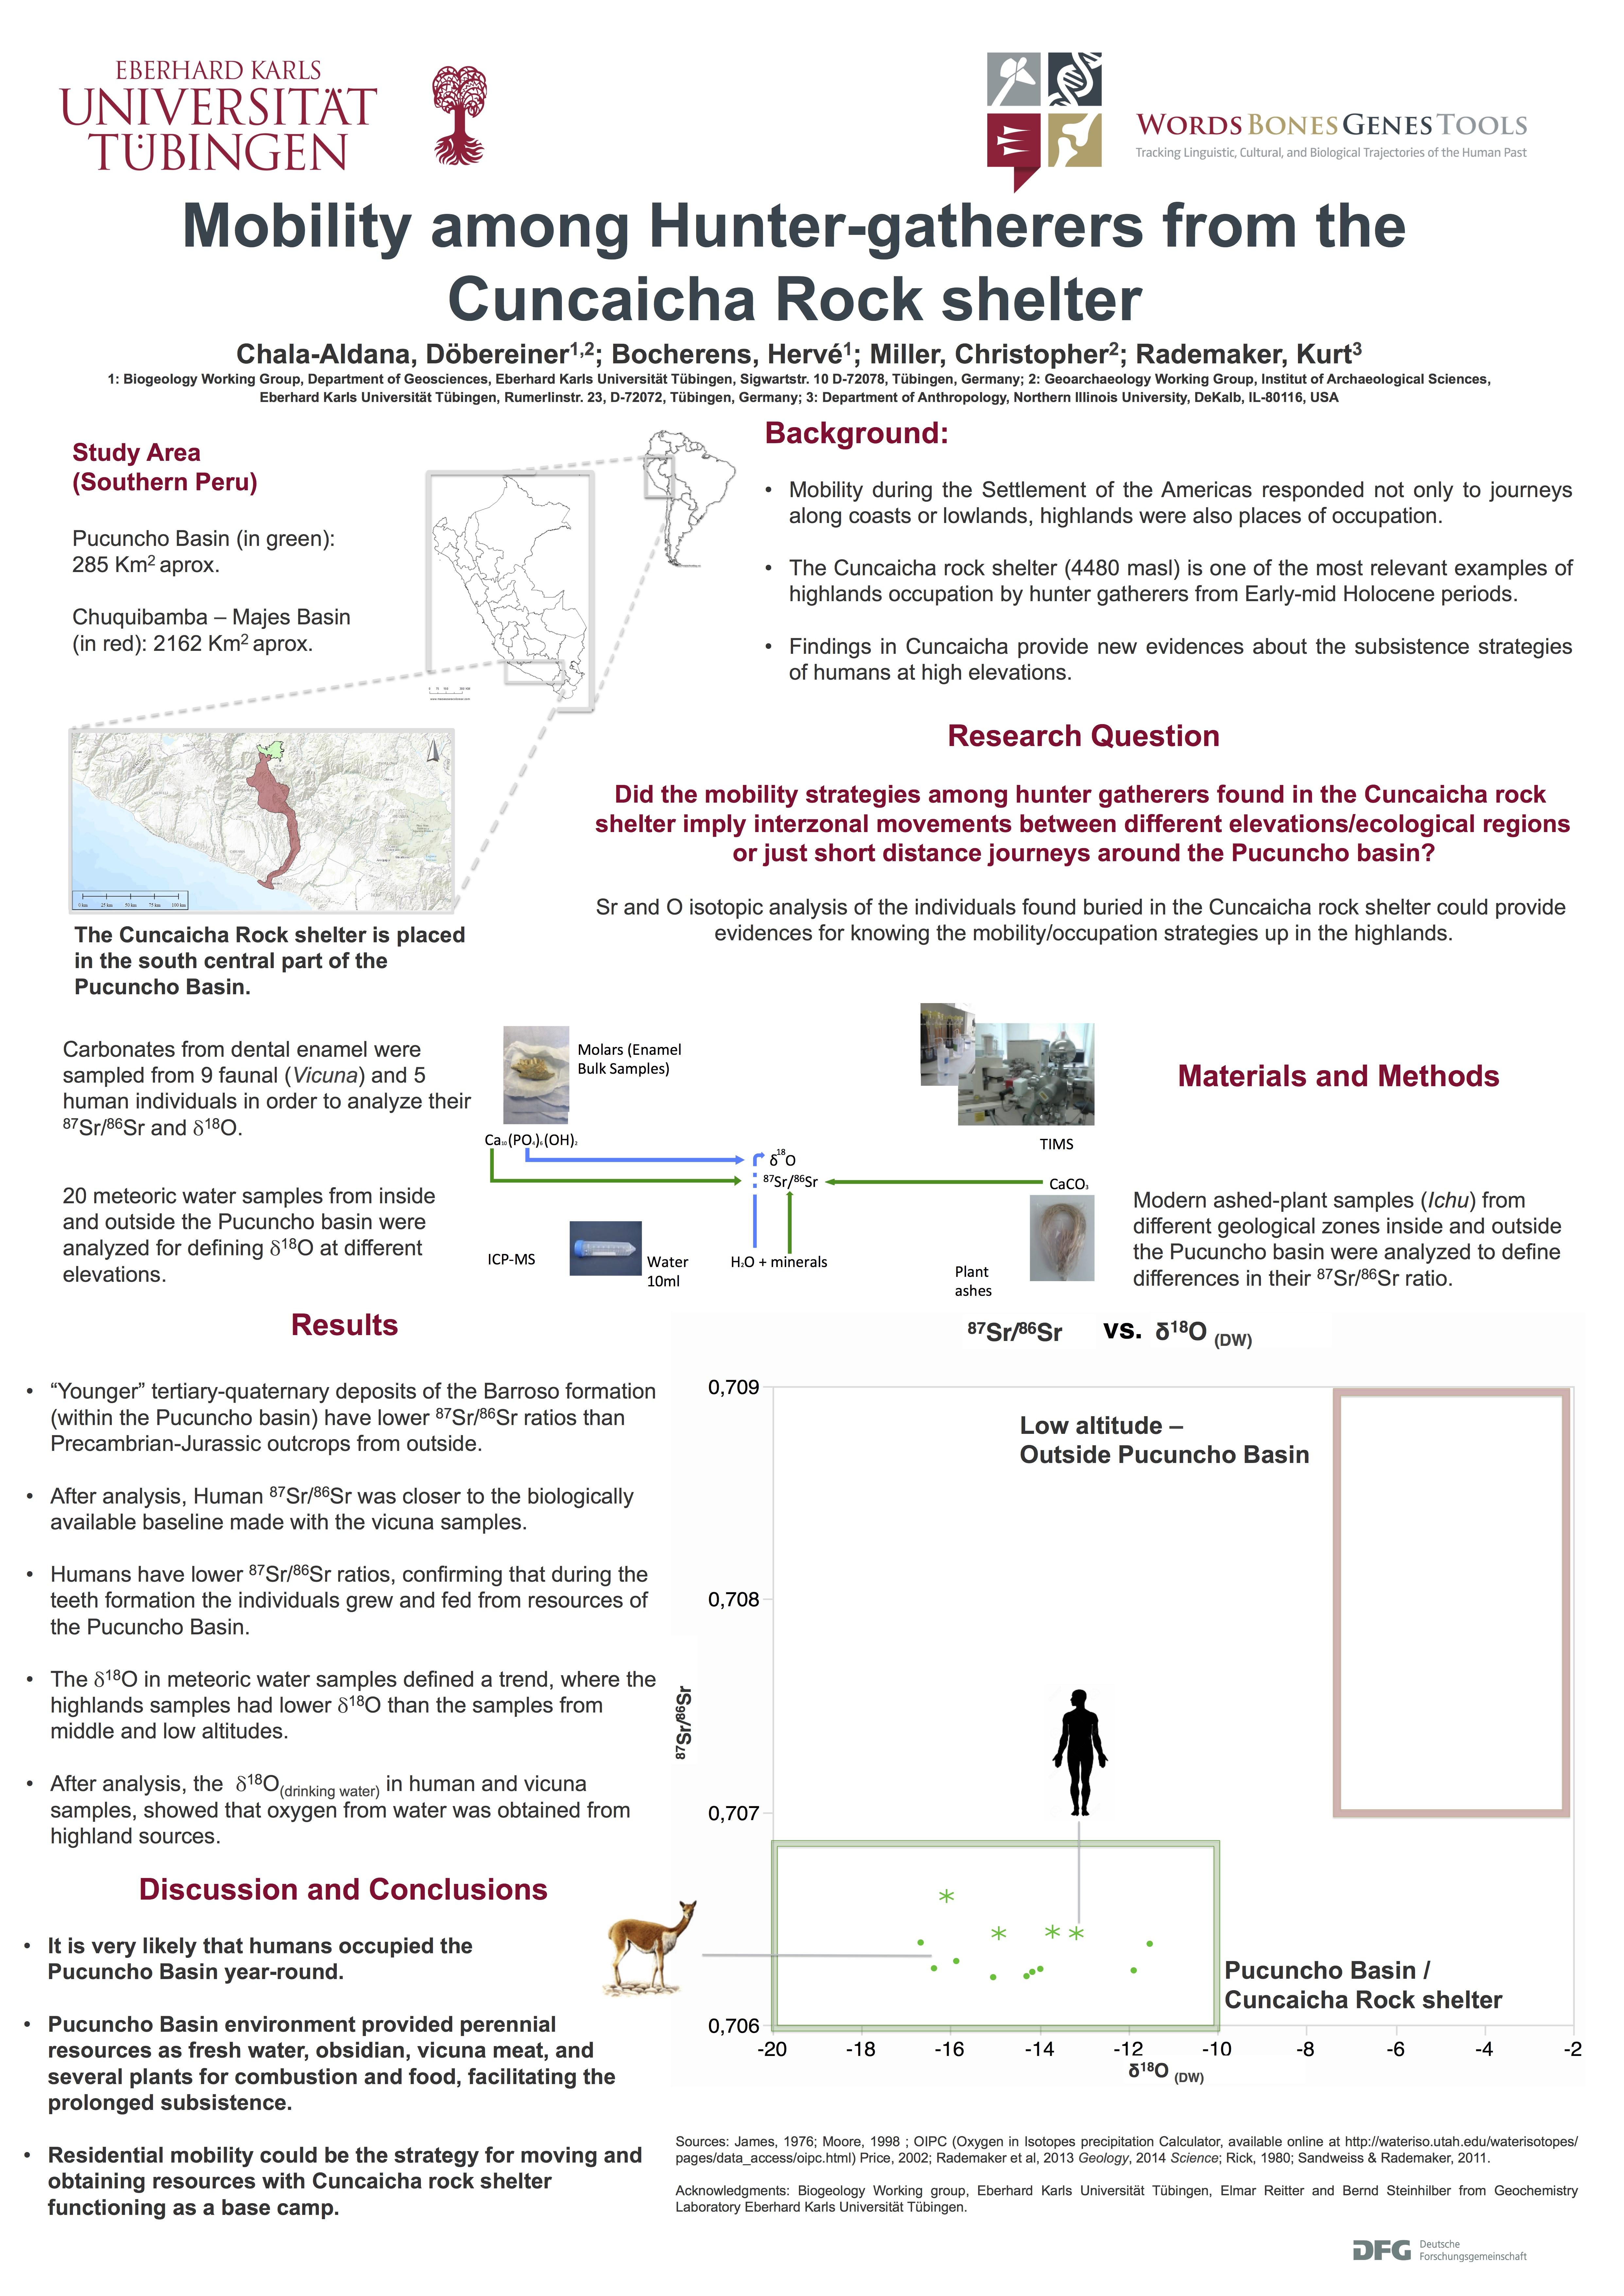 Poster Symposium 05.11.2016 Dober